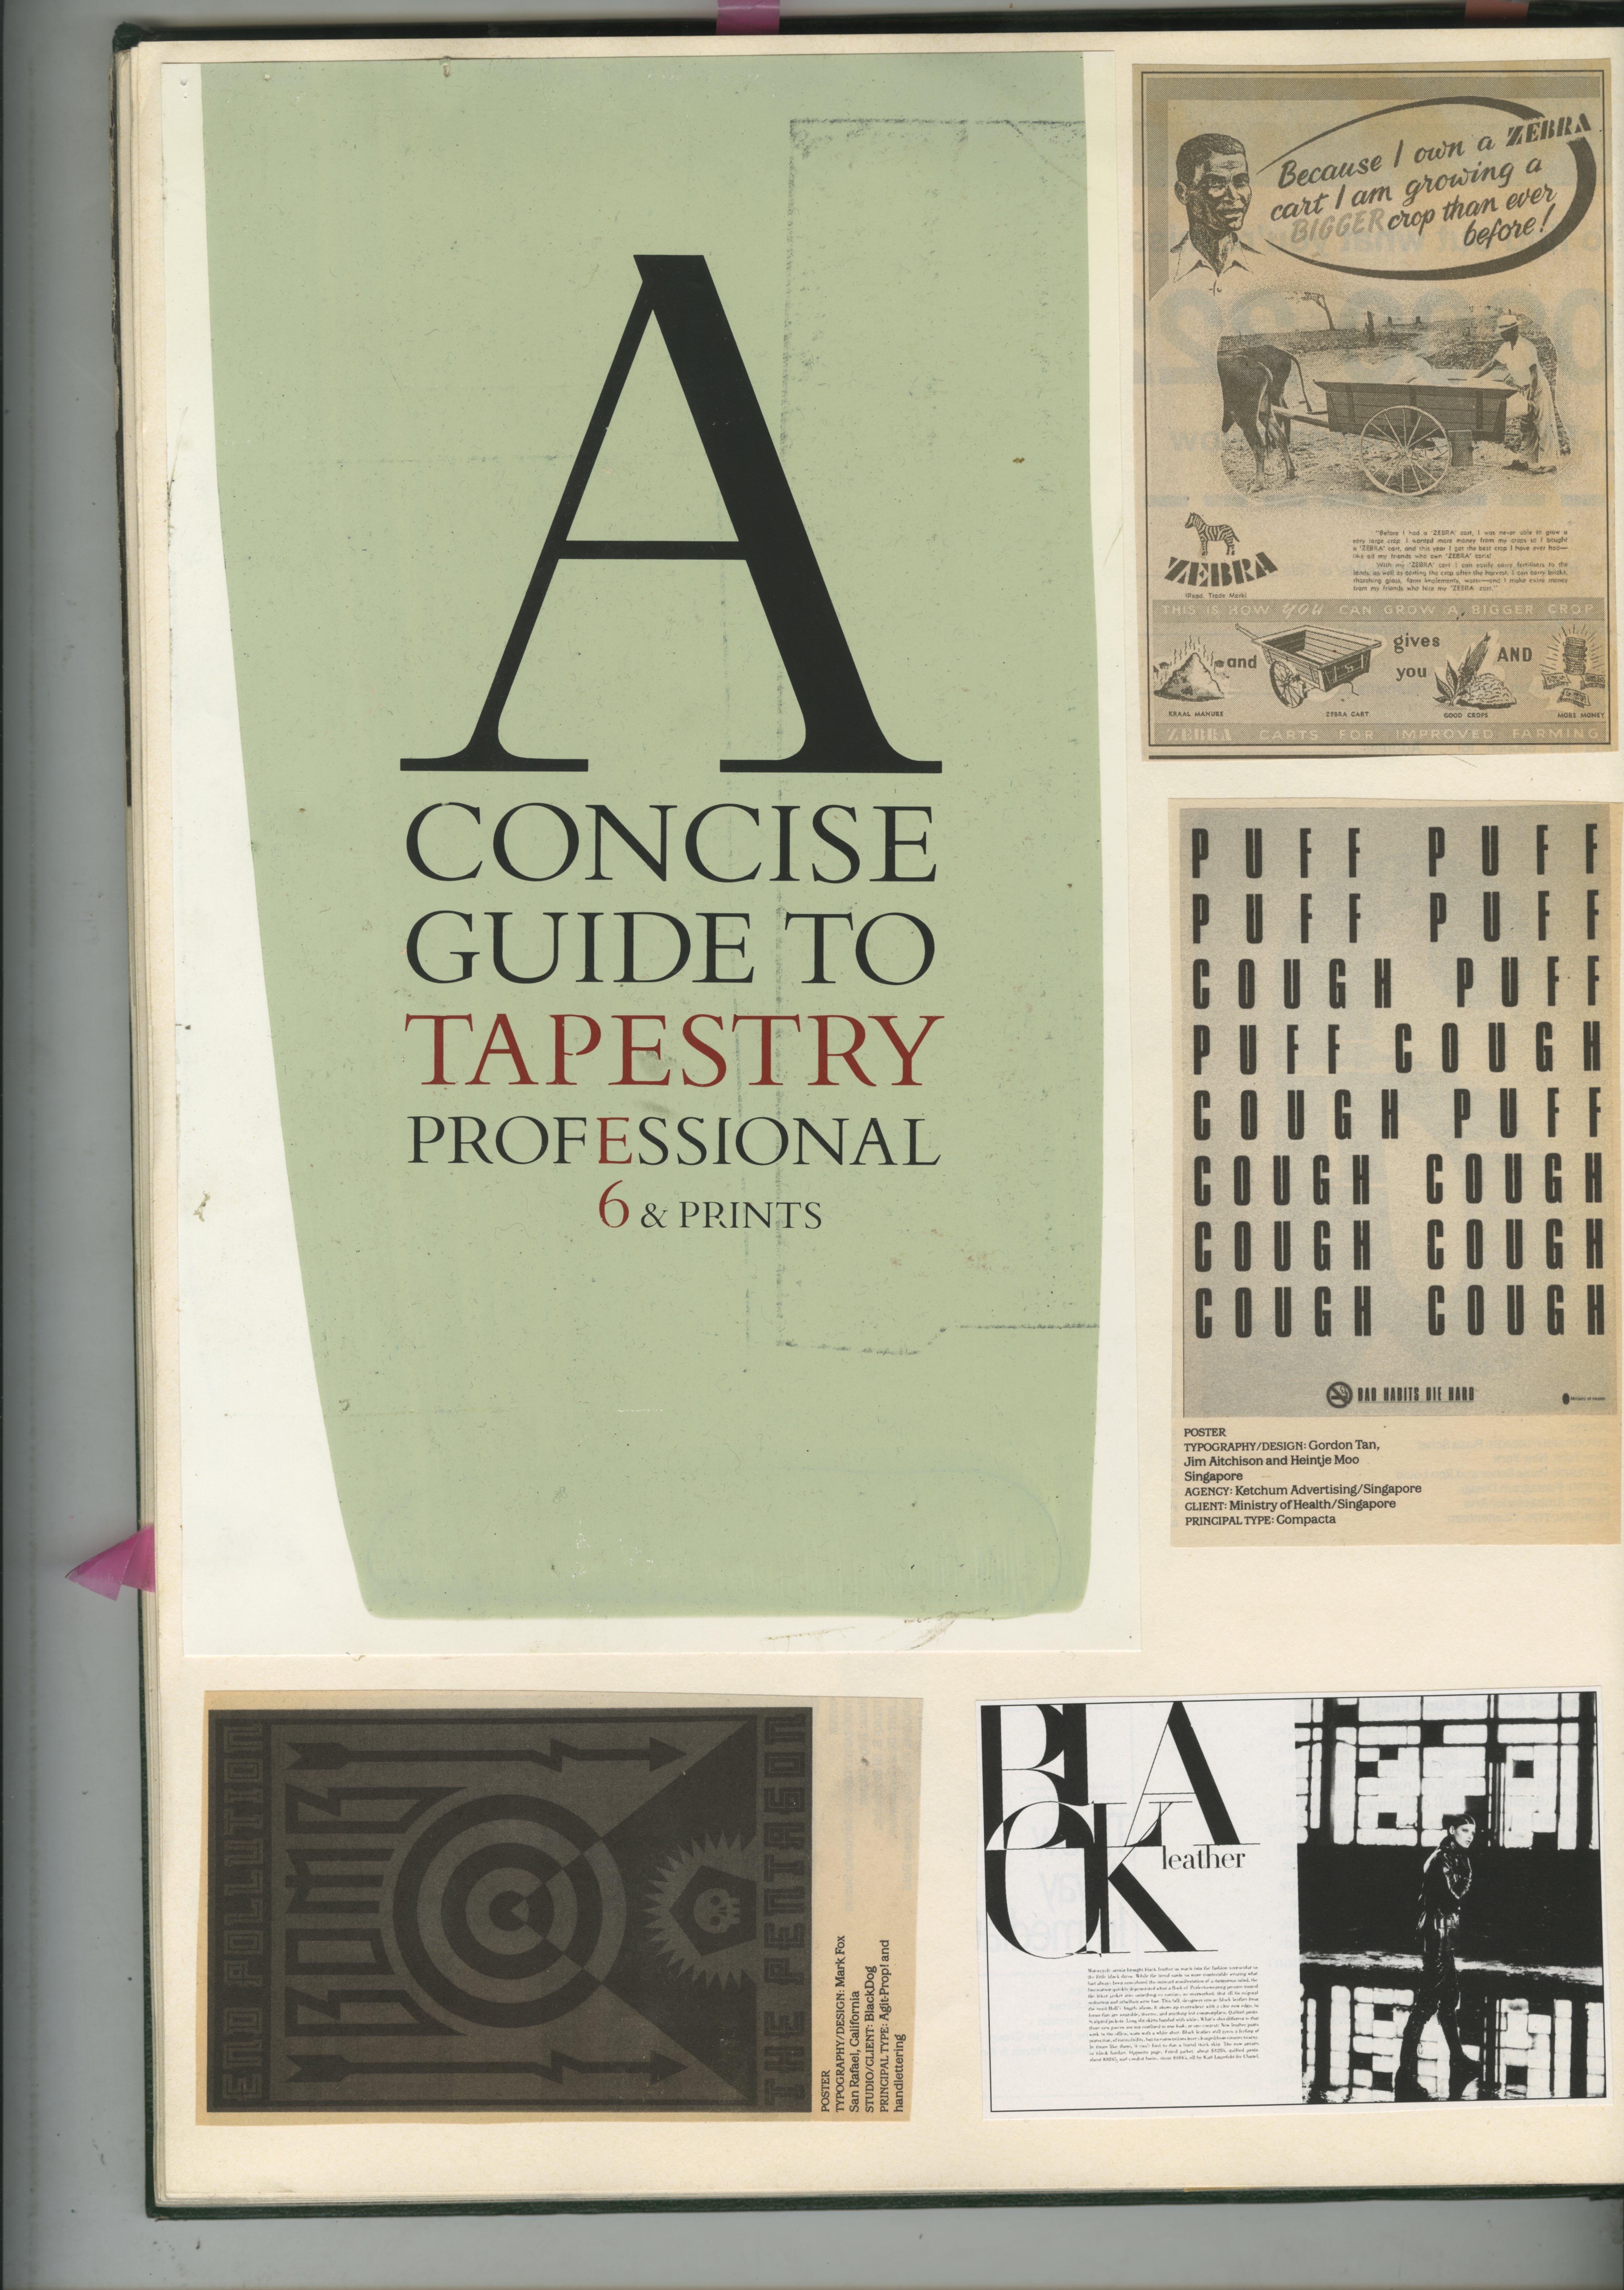 76. GREEN BOOKS: 'Type'